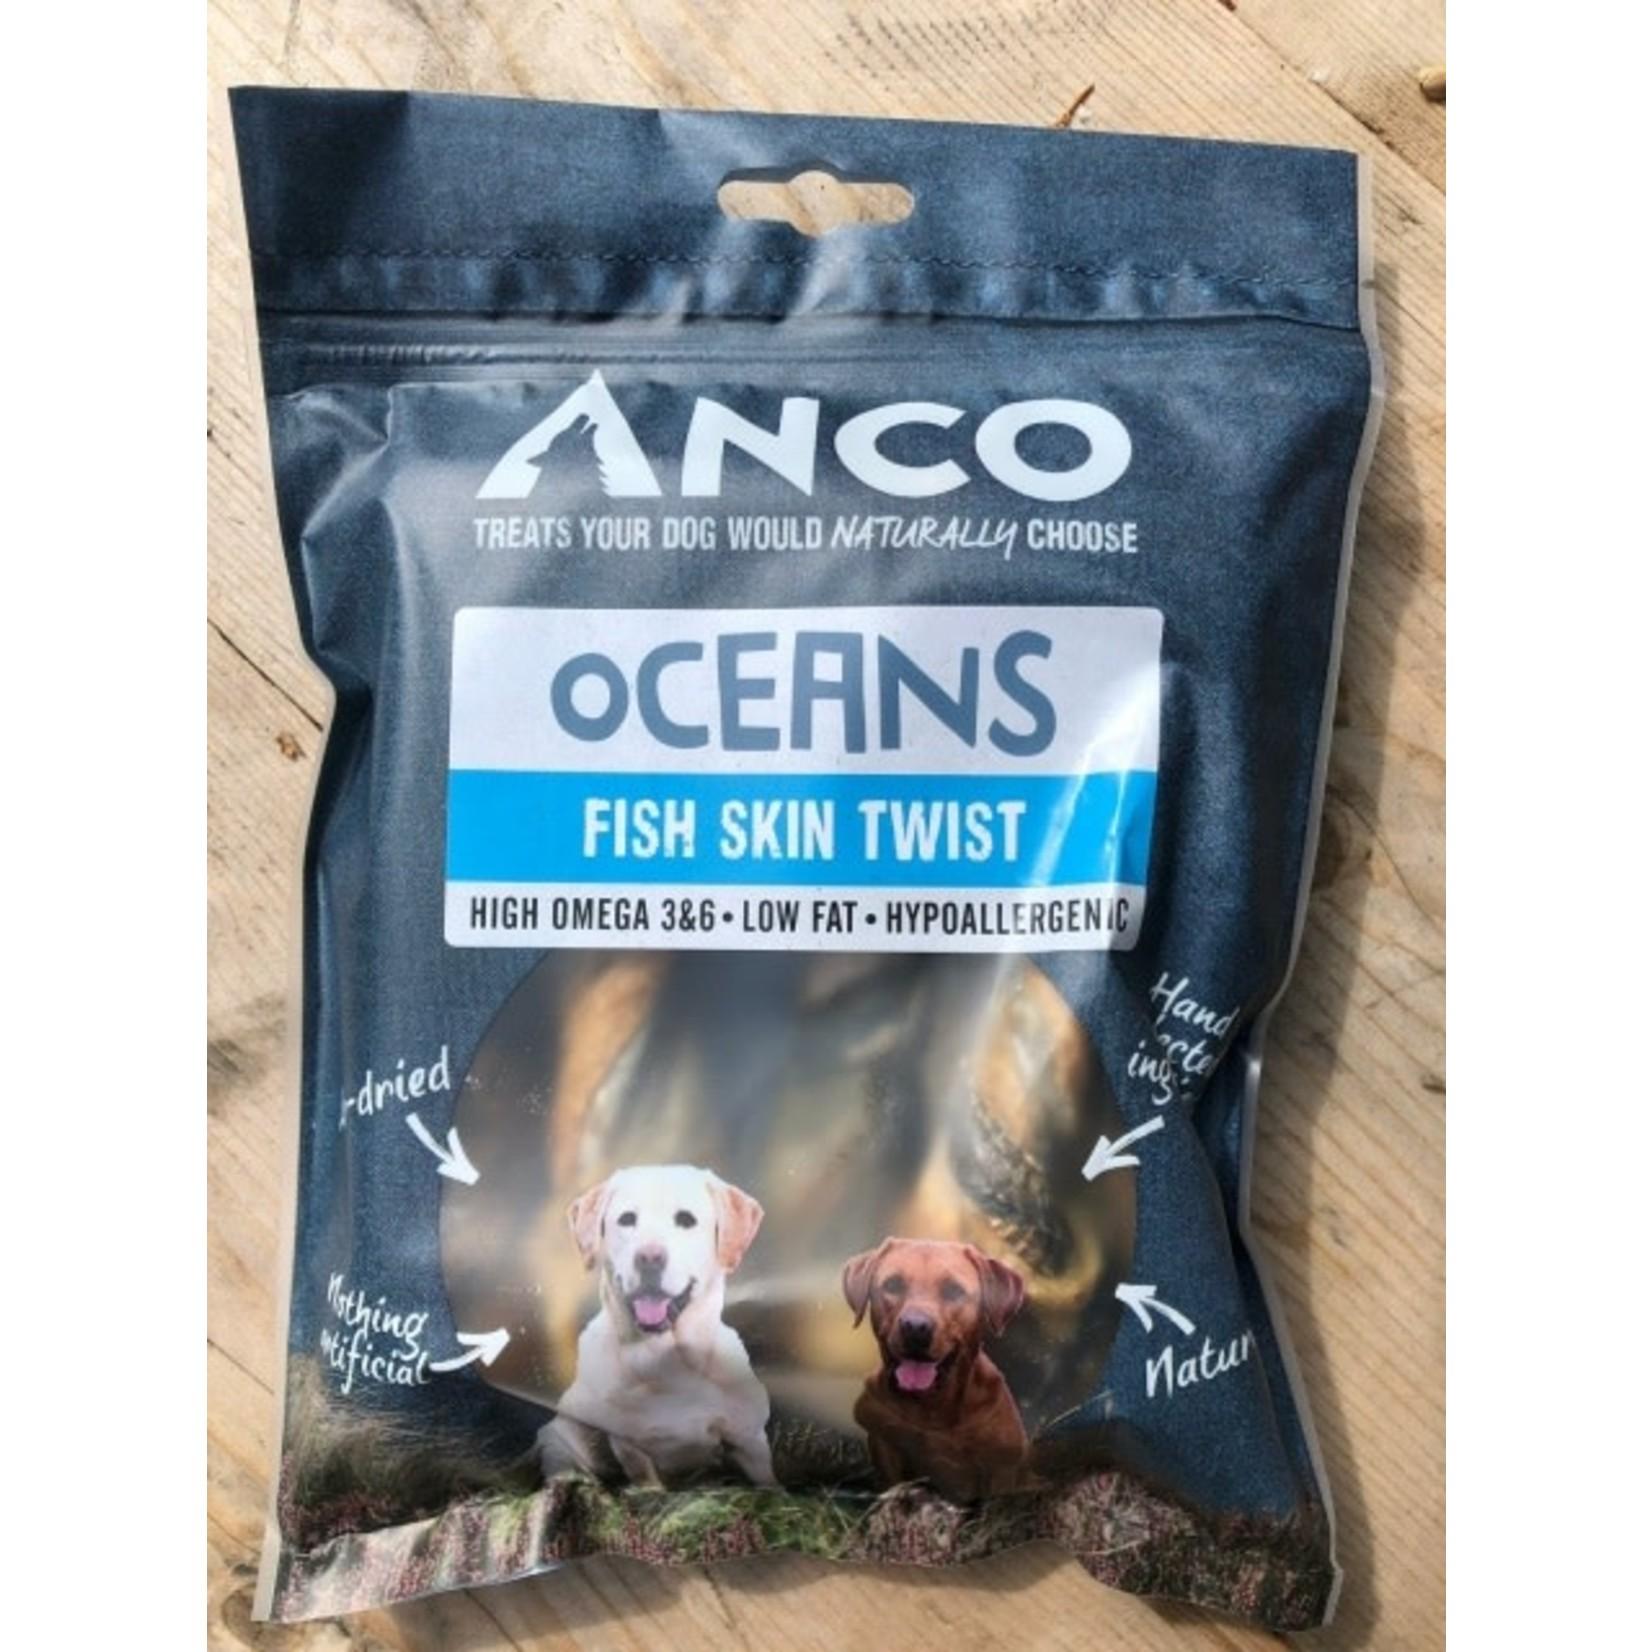 Anco Oceans Fish Skin Twists Dog Treat, 100g